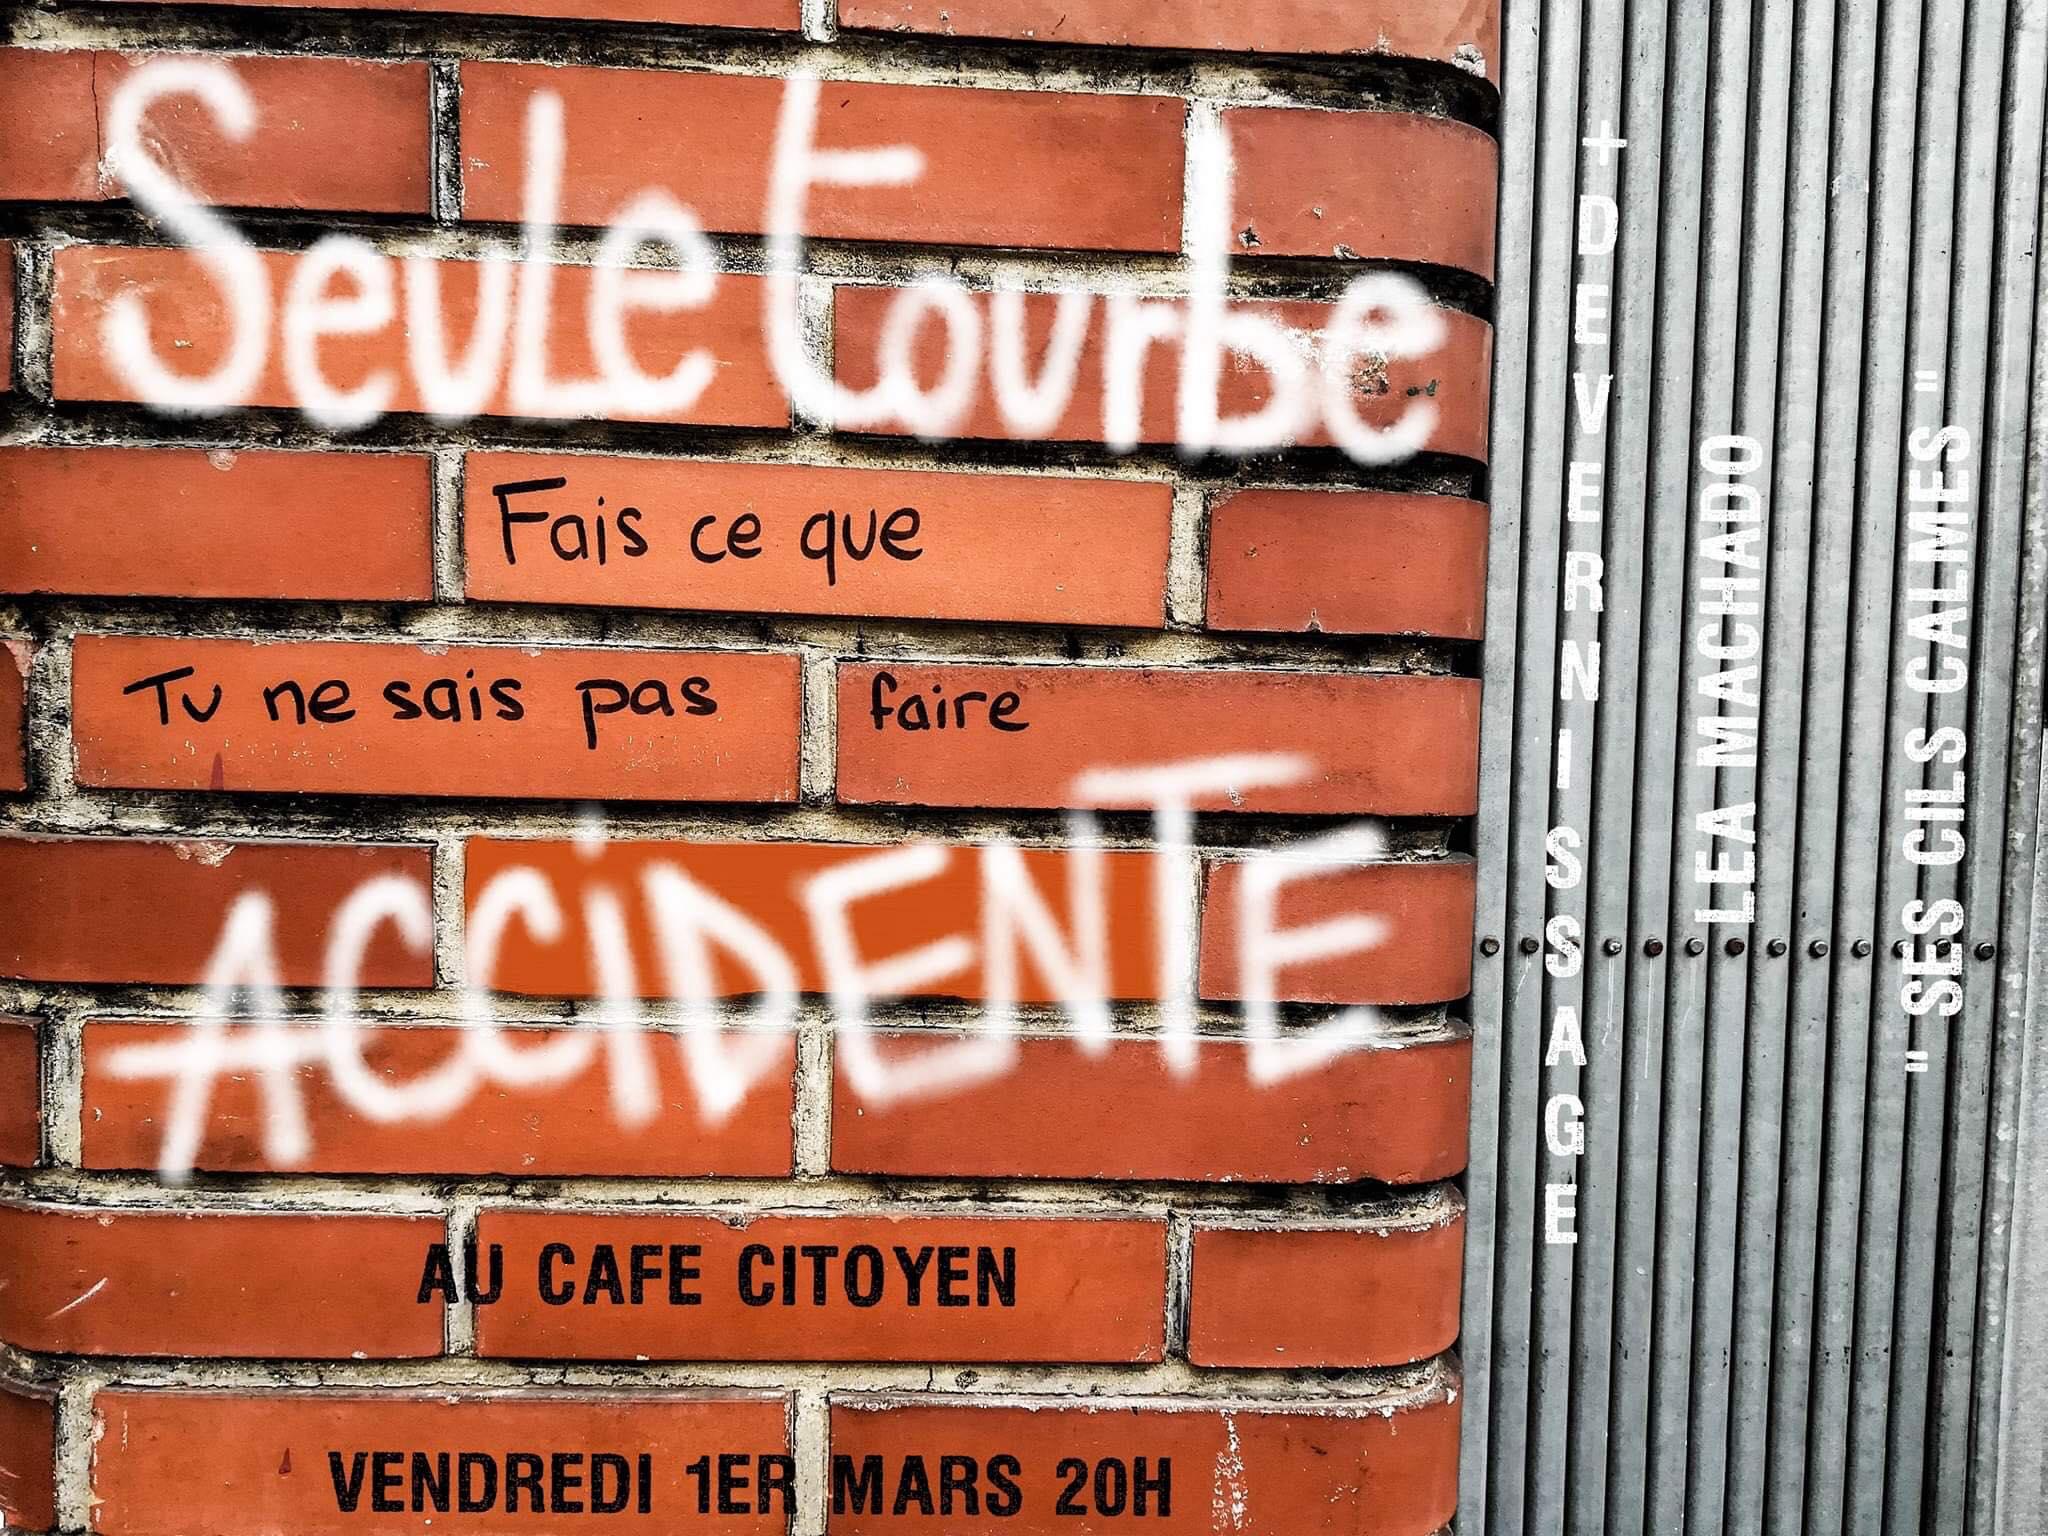 Seule Tourbe + Accidente